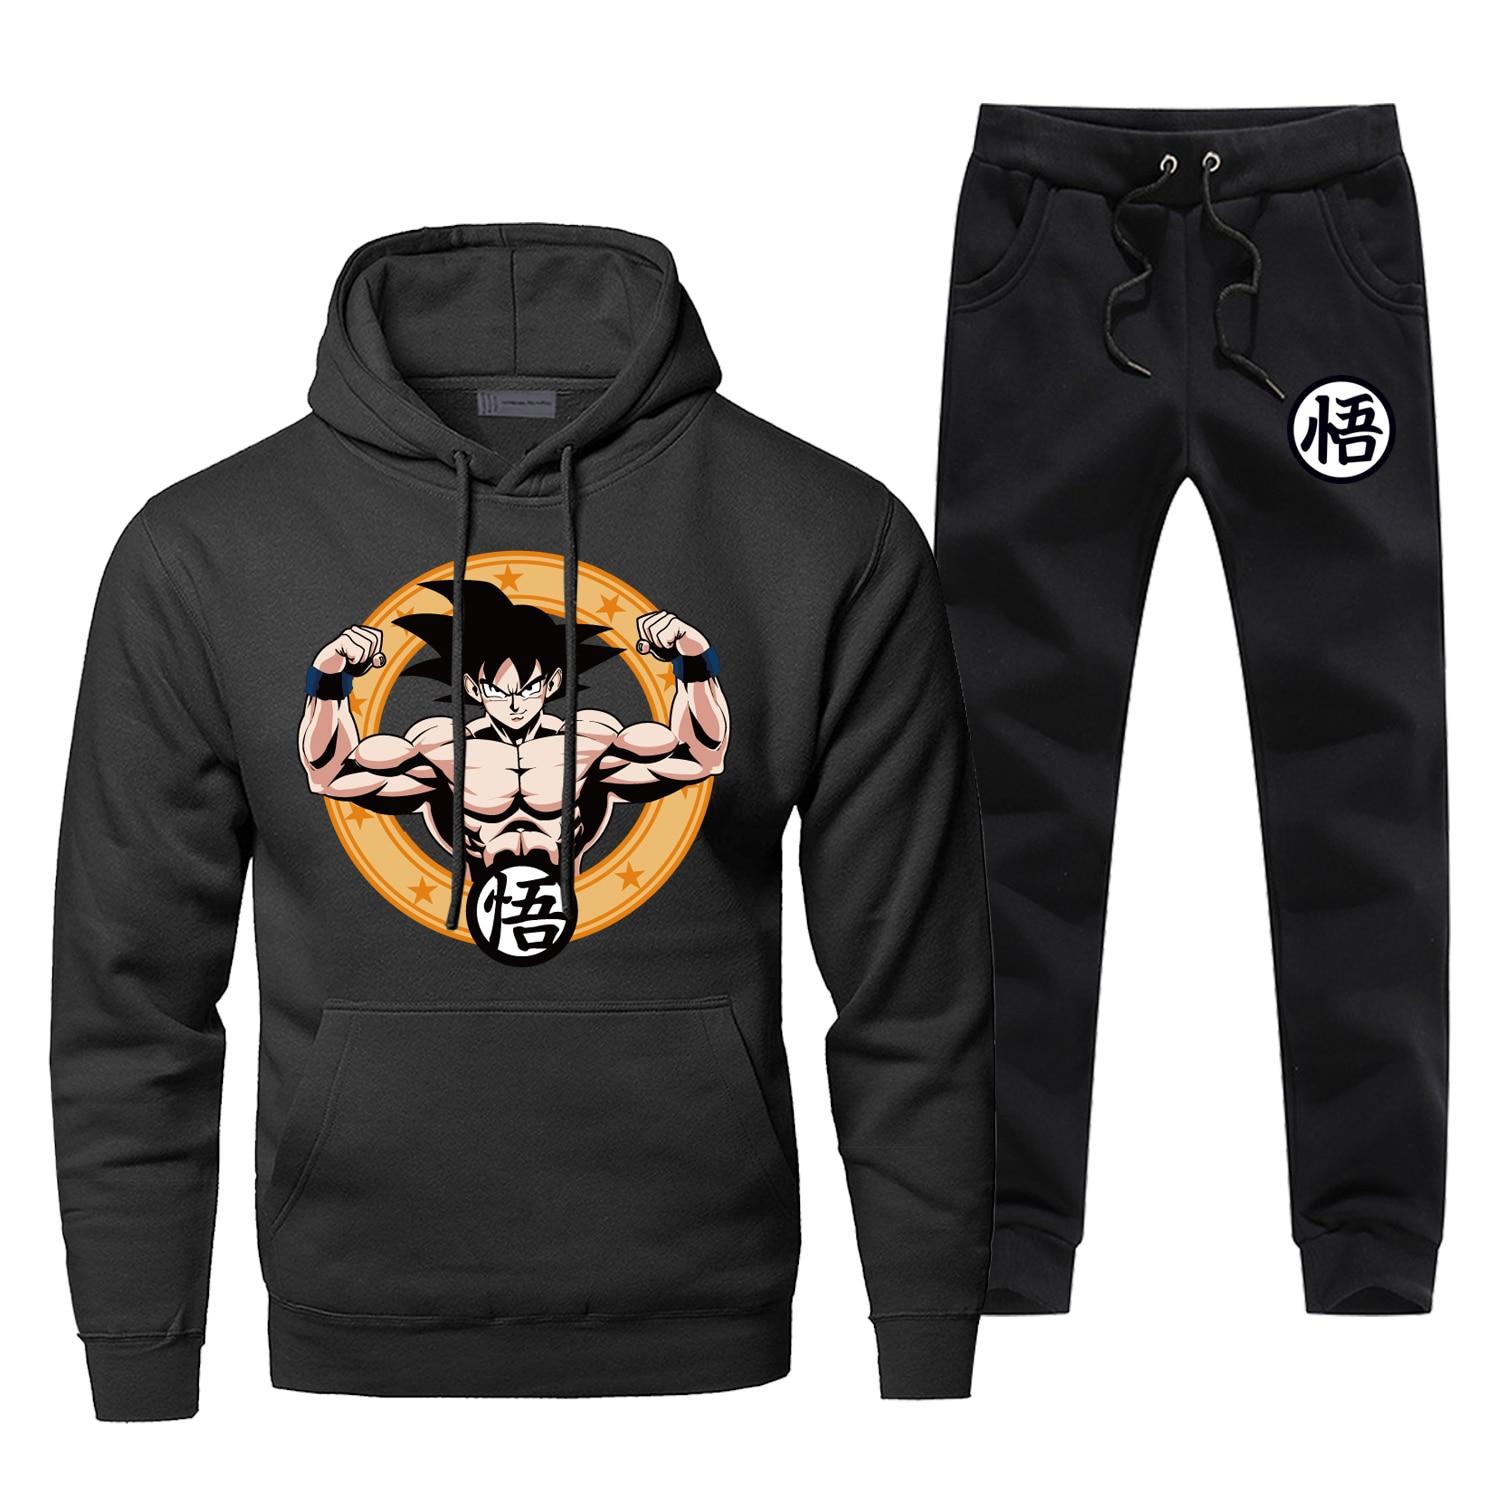 Japan Anime Dragon Ball Z Print Complete Man Tracksuit Harajuku Fashion Sportsman Wear Casual 2 Piece Set Gym Suit Streetwear